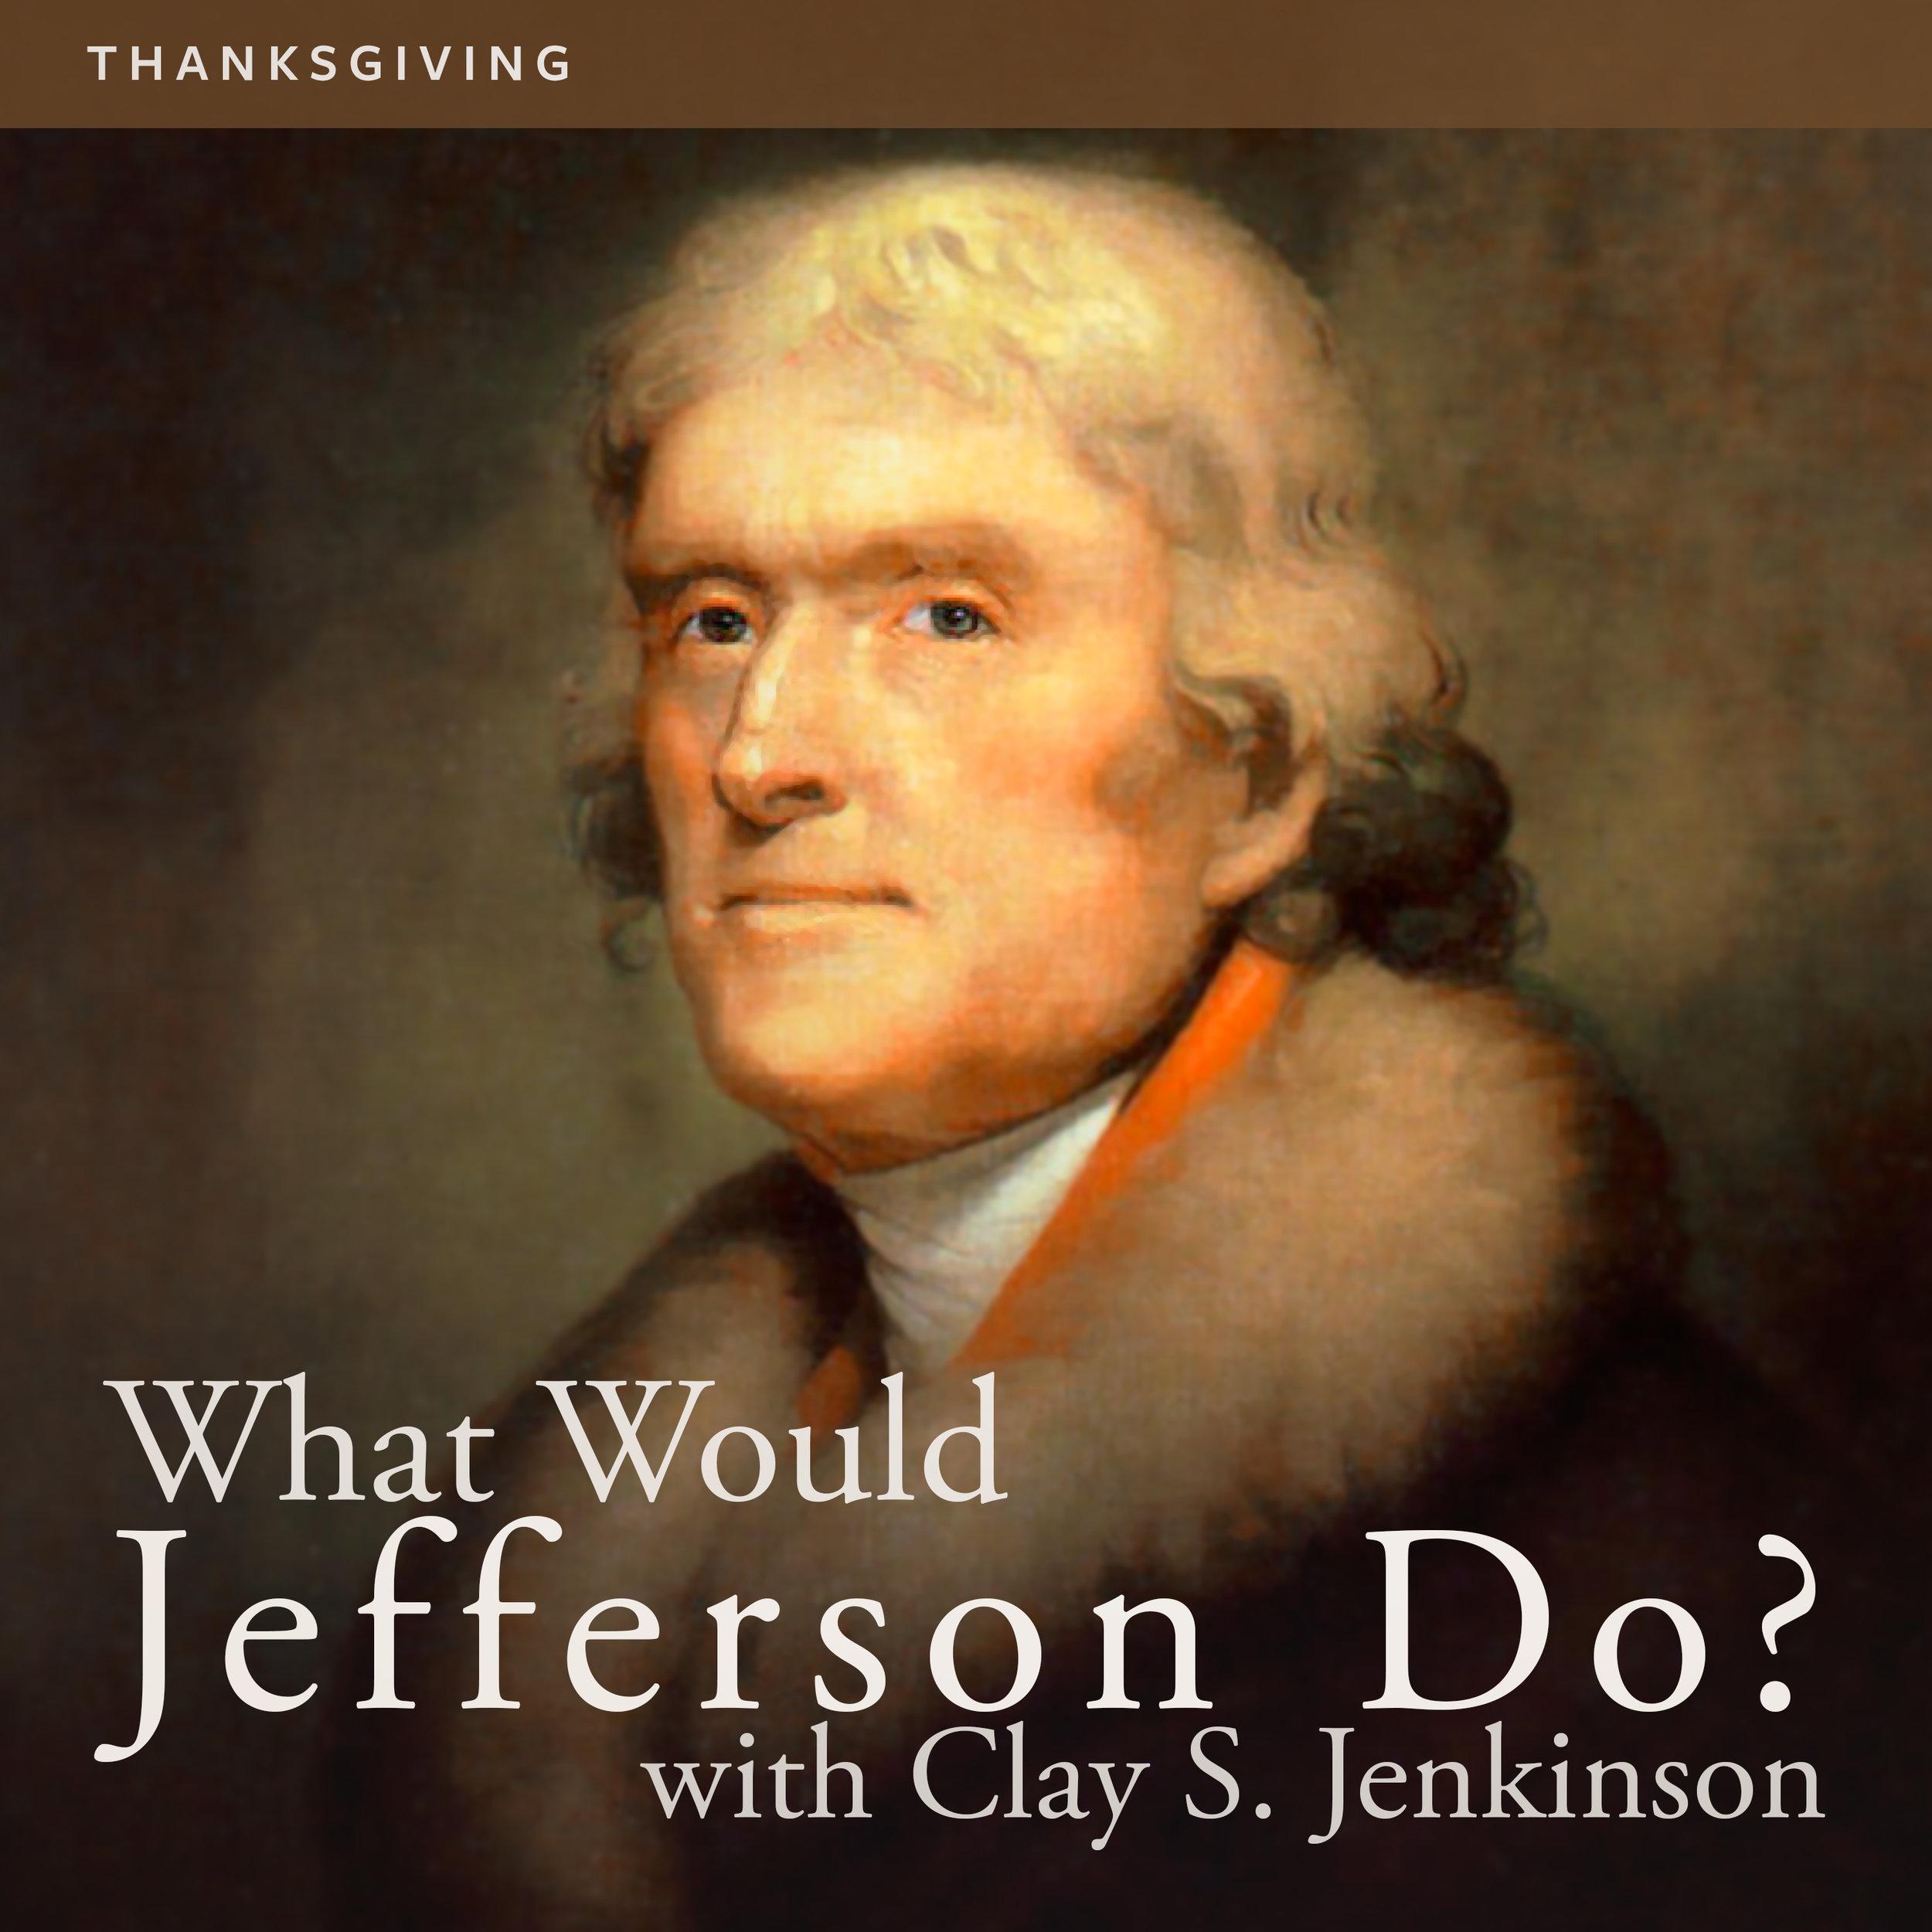 WWTJD_1261 Thanksgiving.jpg